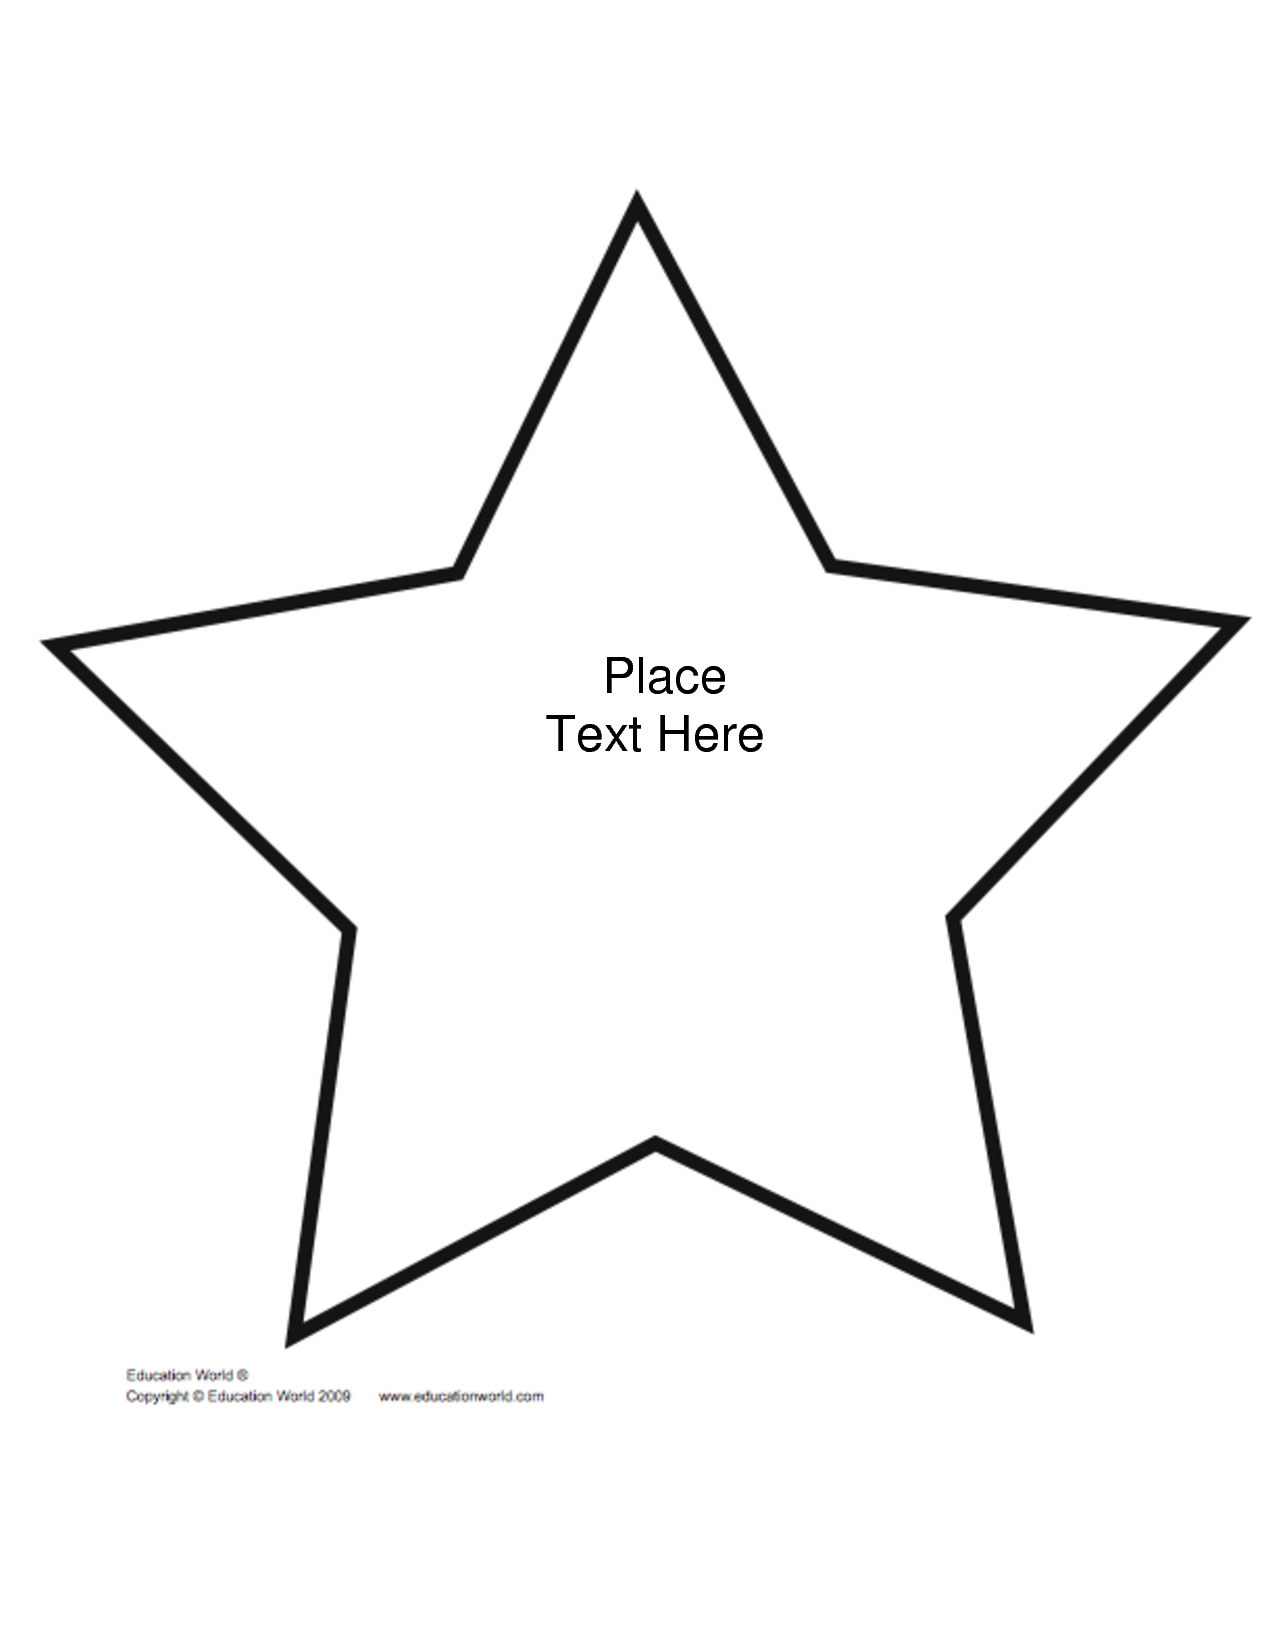 Free Printable Star Shape Templates Star Template Star Template Printable Printable Shapes